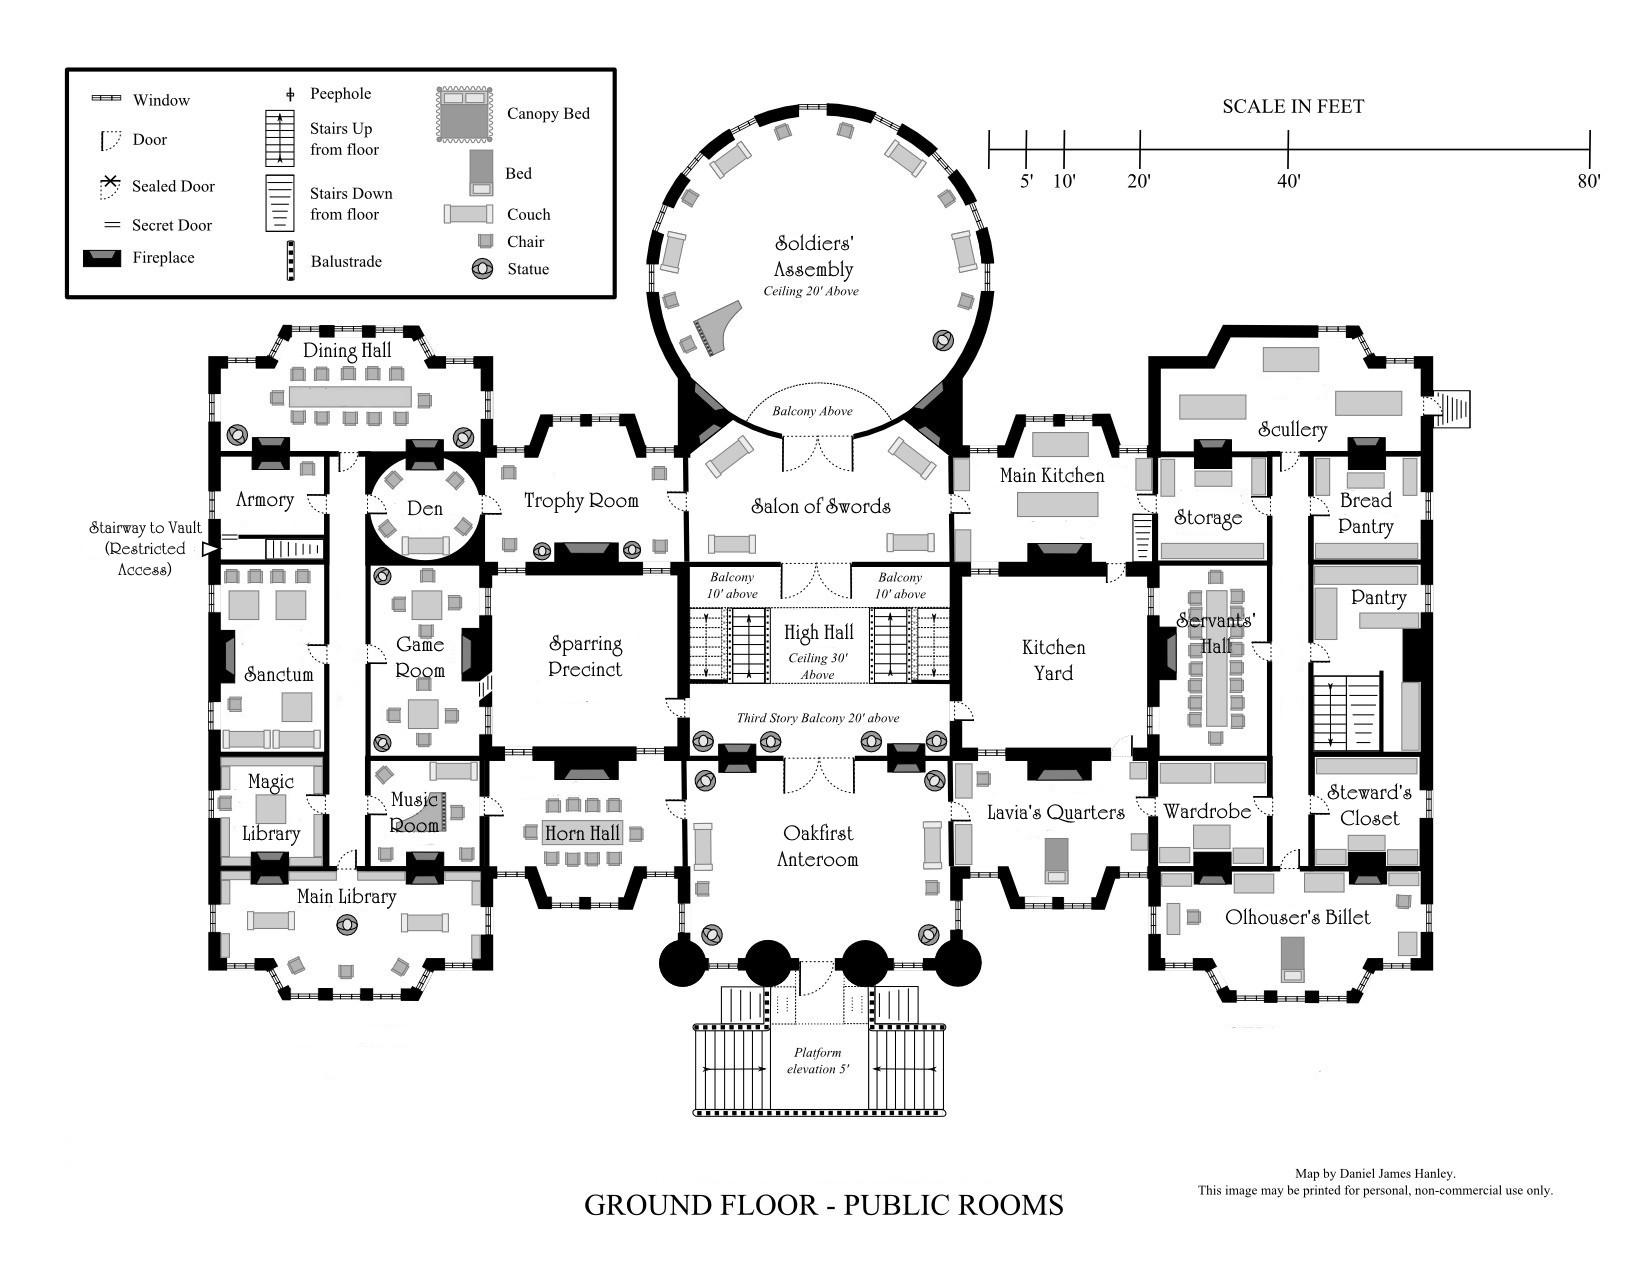 Oakfirst Manor - Ground Floor.jpg